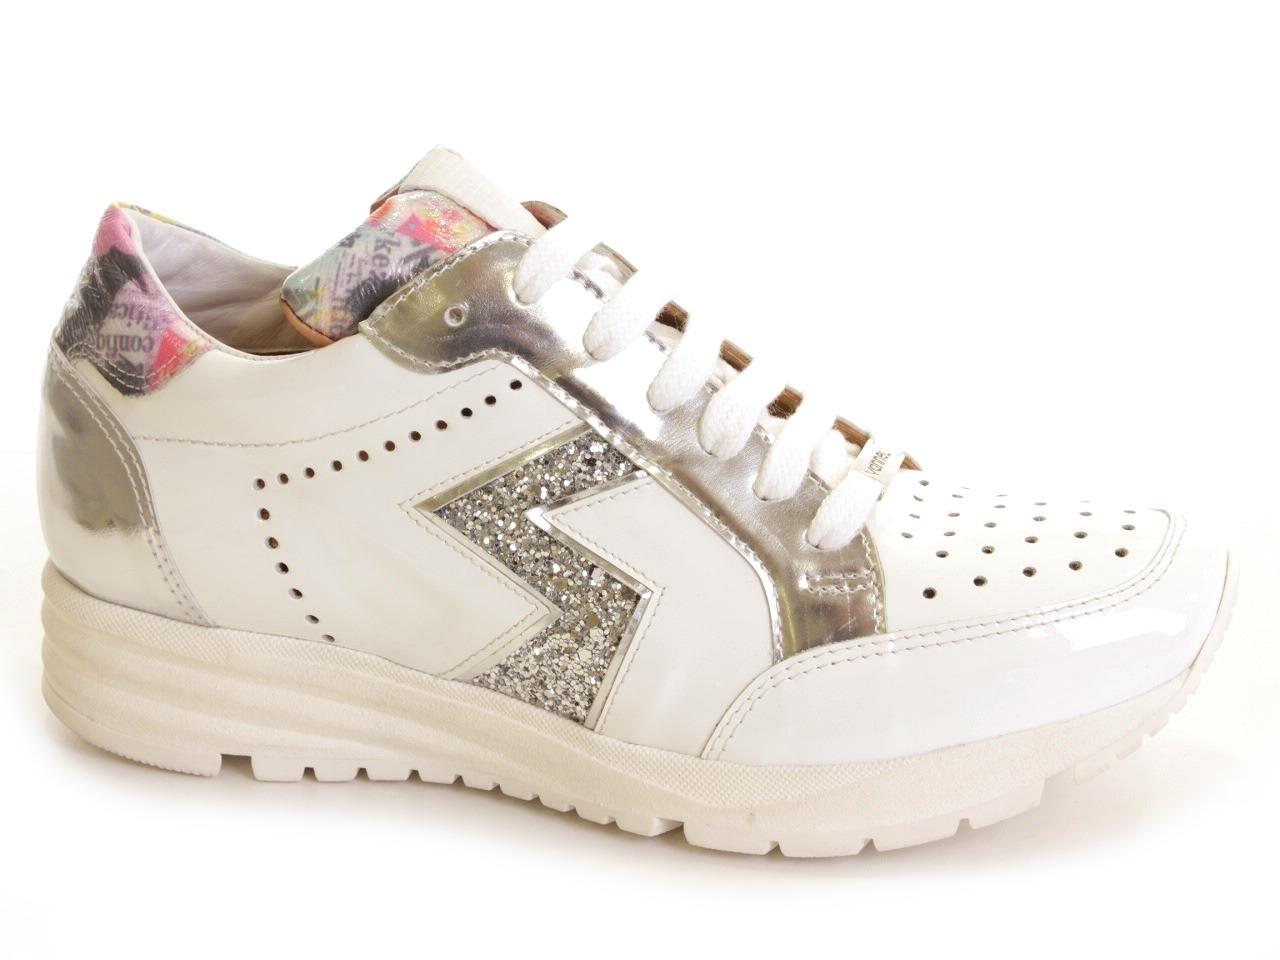 Sneakers and Espadrilles Vannel - 001 8430